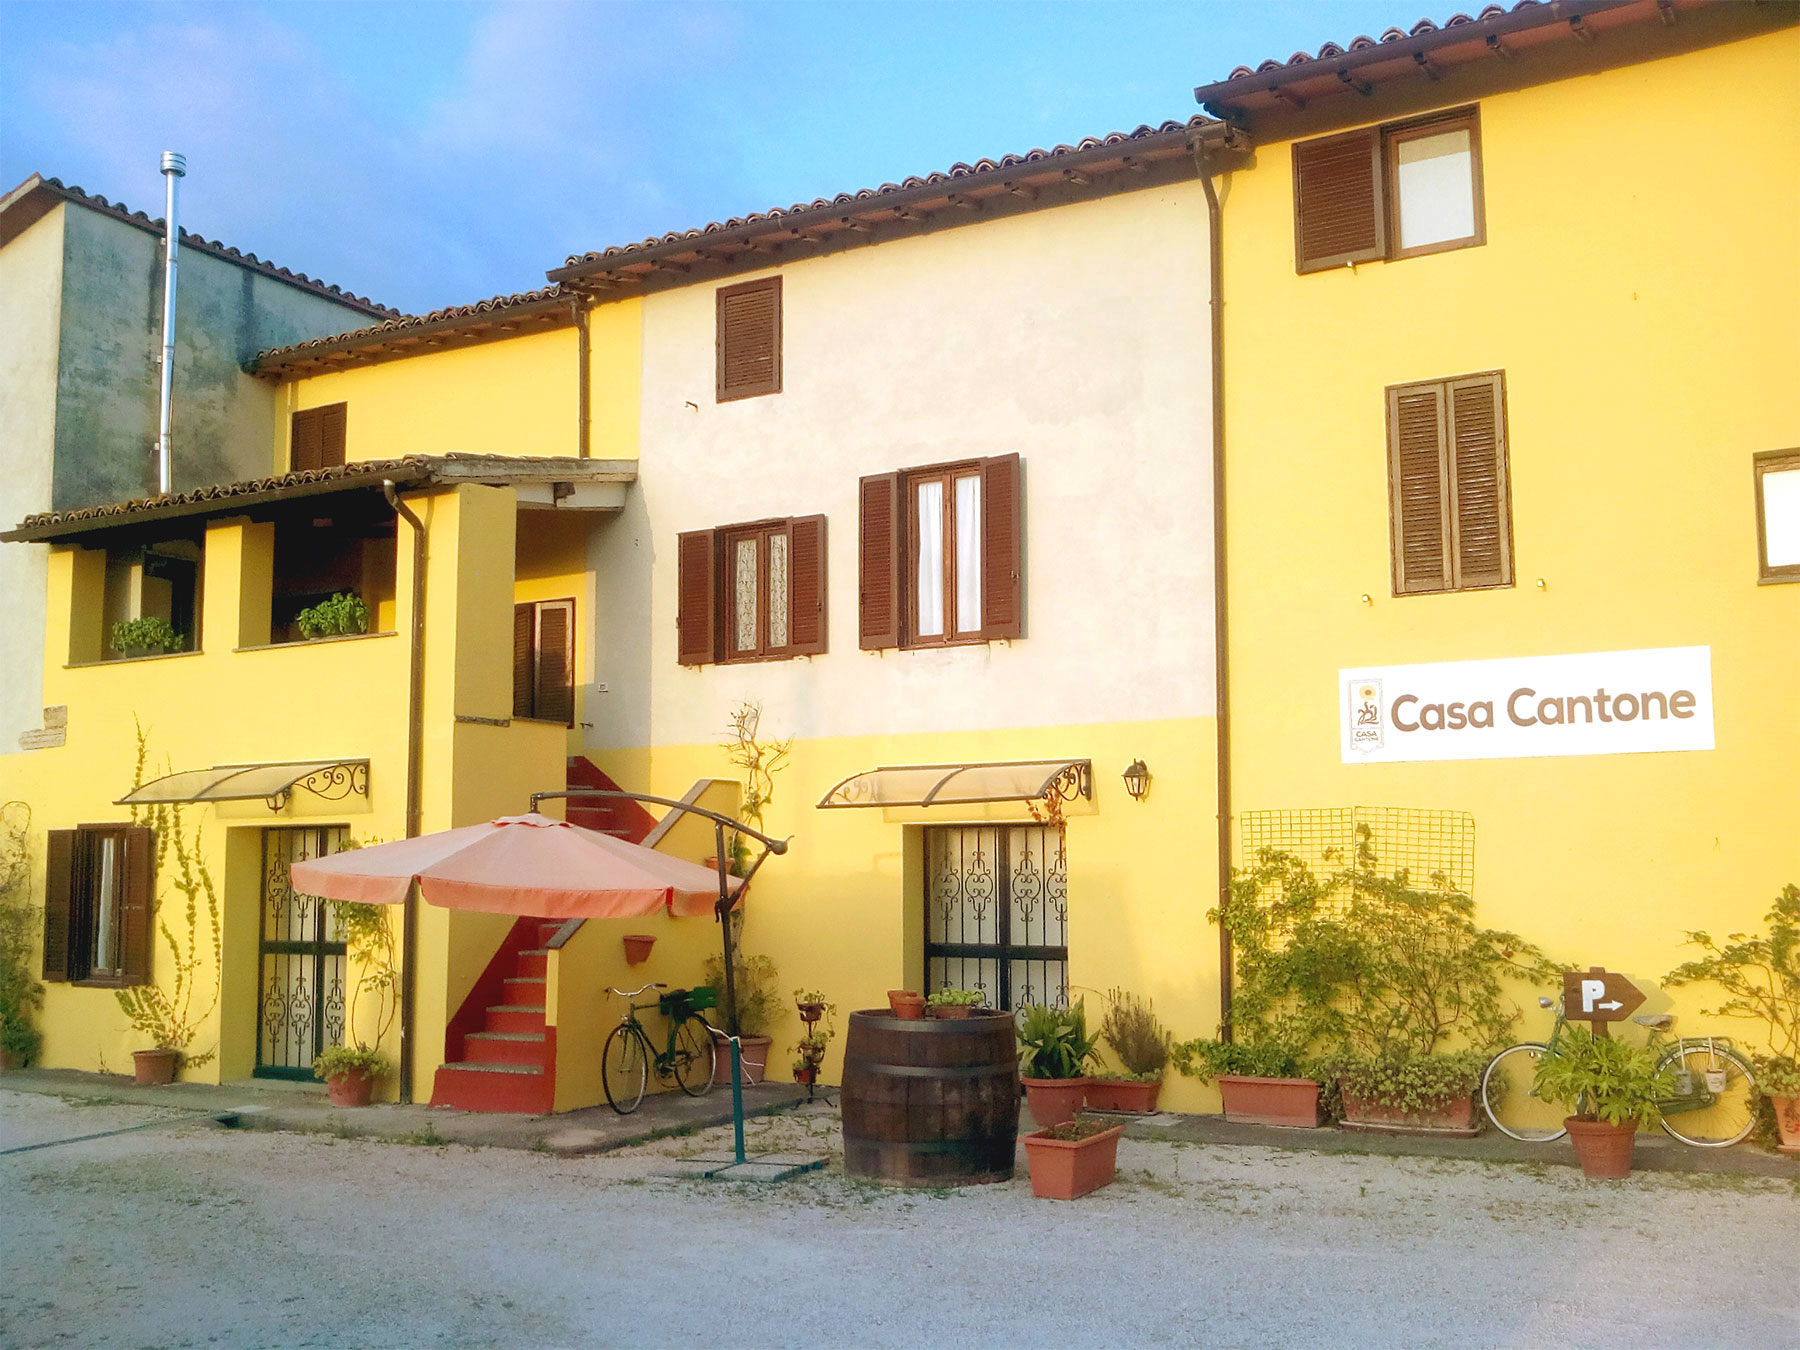 Casa Cantone